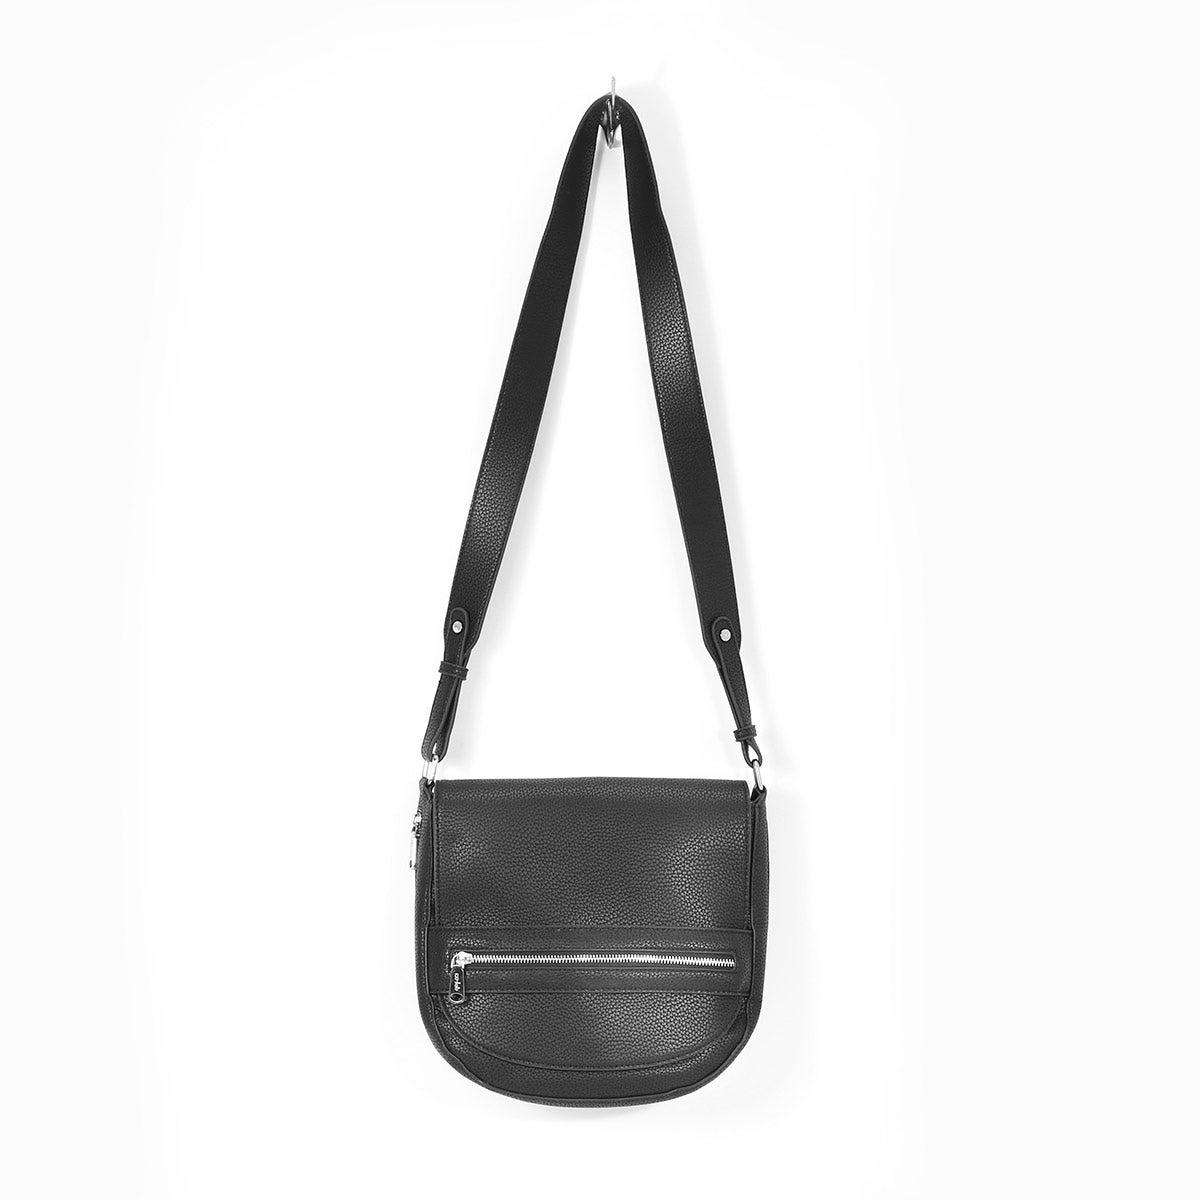 Lds Winnie black cross body bag